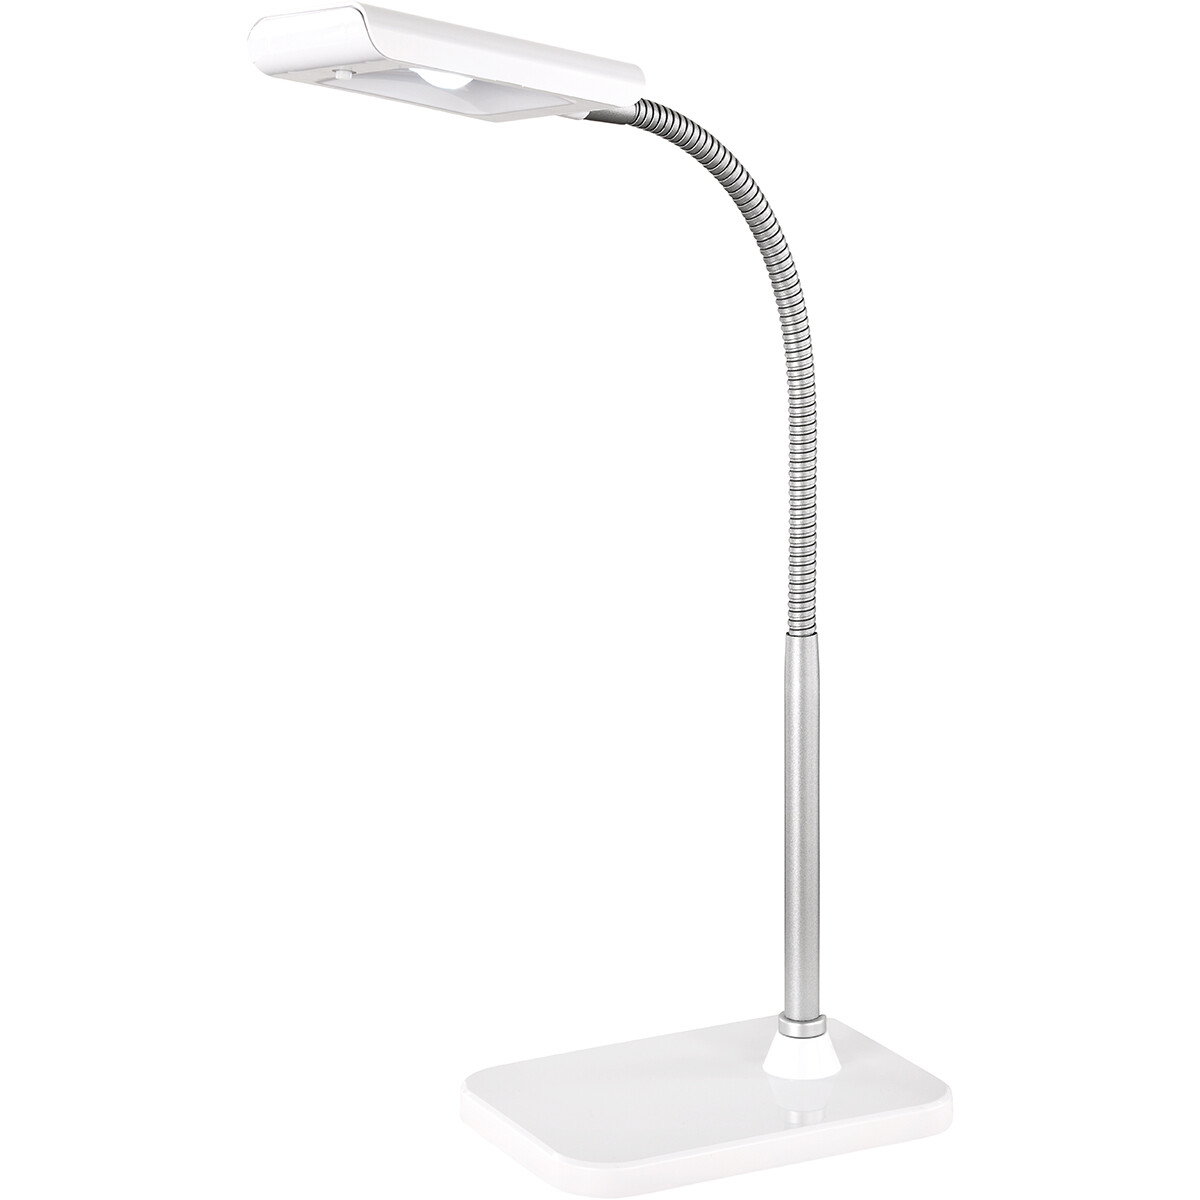 LED Tafellamp - Tafelverlichting - Trion Piko - 3W - Warm Wit 3000K - Rechthoek - Mat Wit - Aluminiu